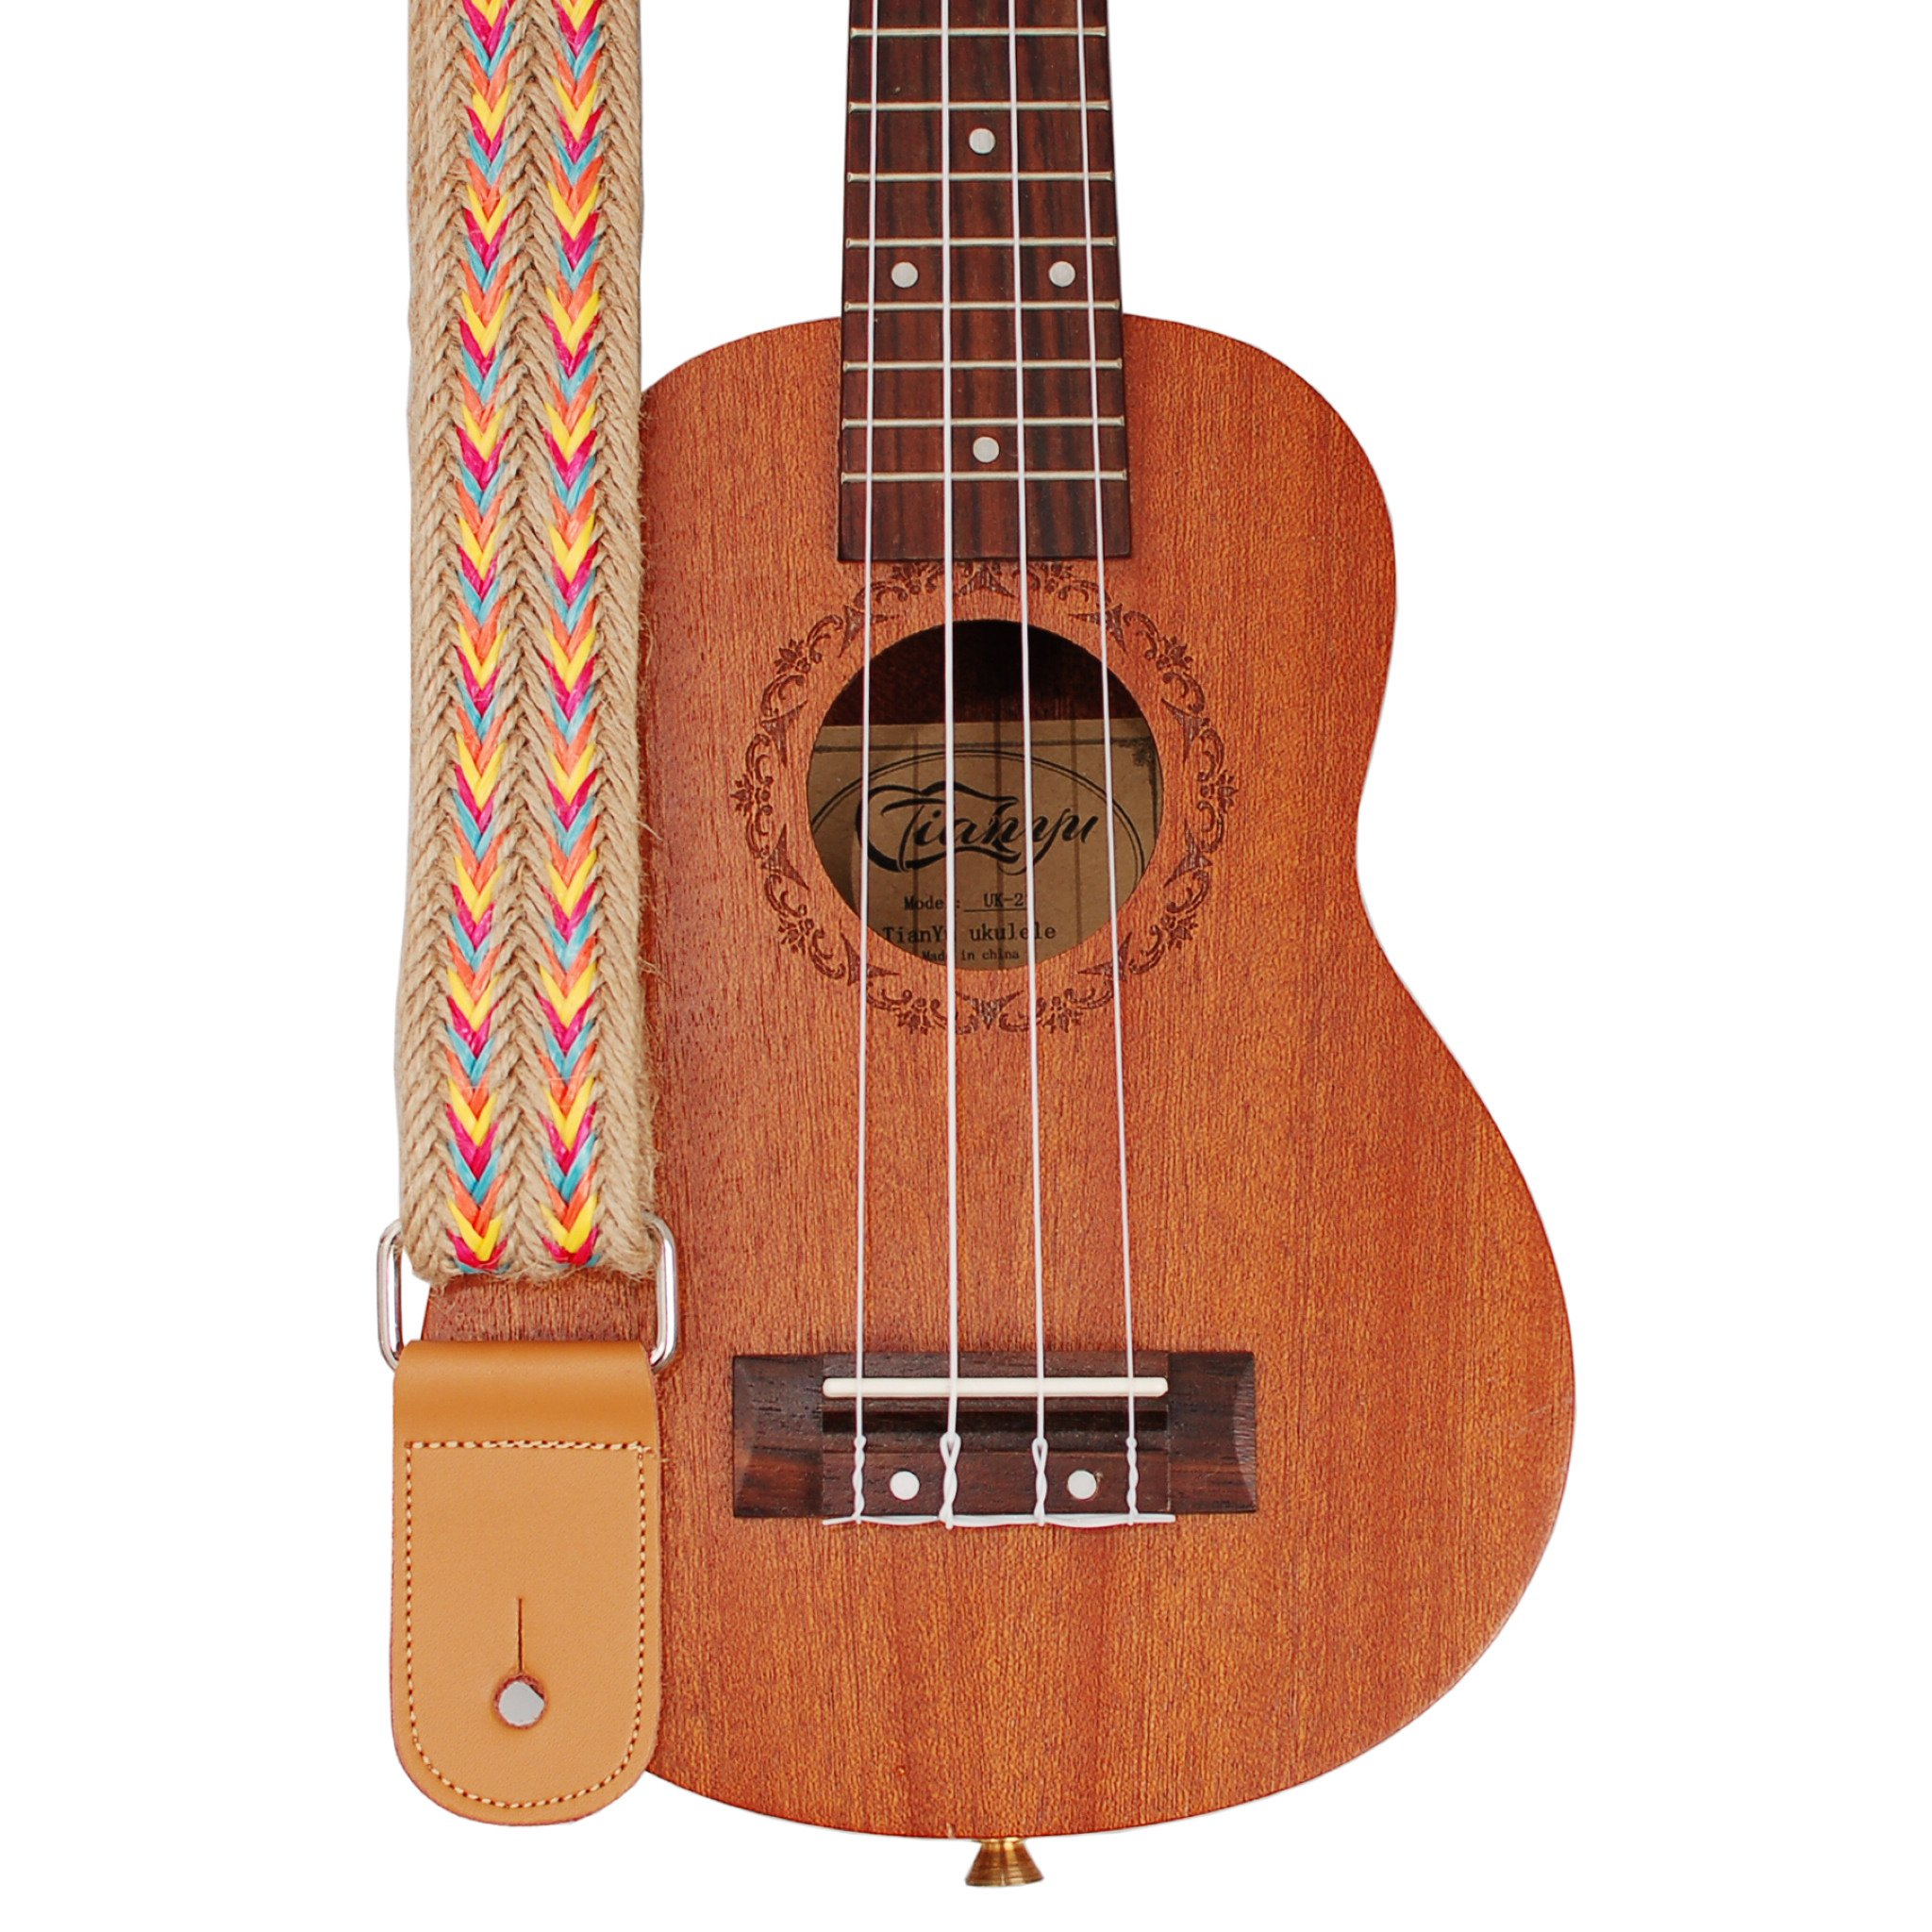 MUSIC FIRST Original Design Hand Made Jute Woven & Genuine Leather Bohemian Style Ukulele Strap Ukulele Shoulder Strap